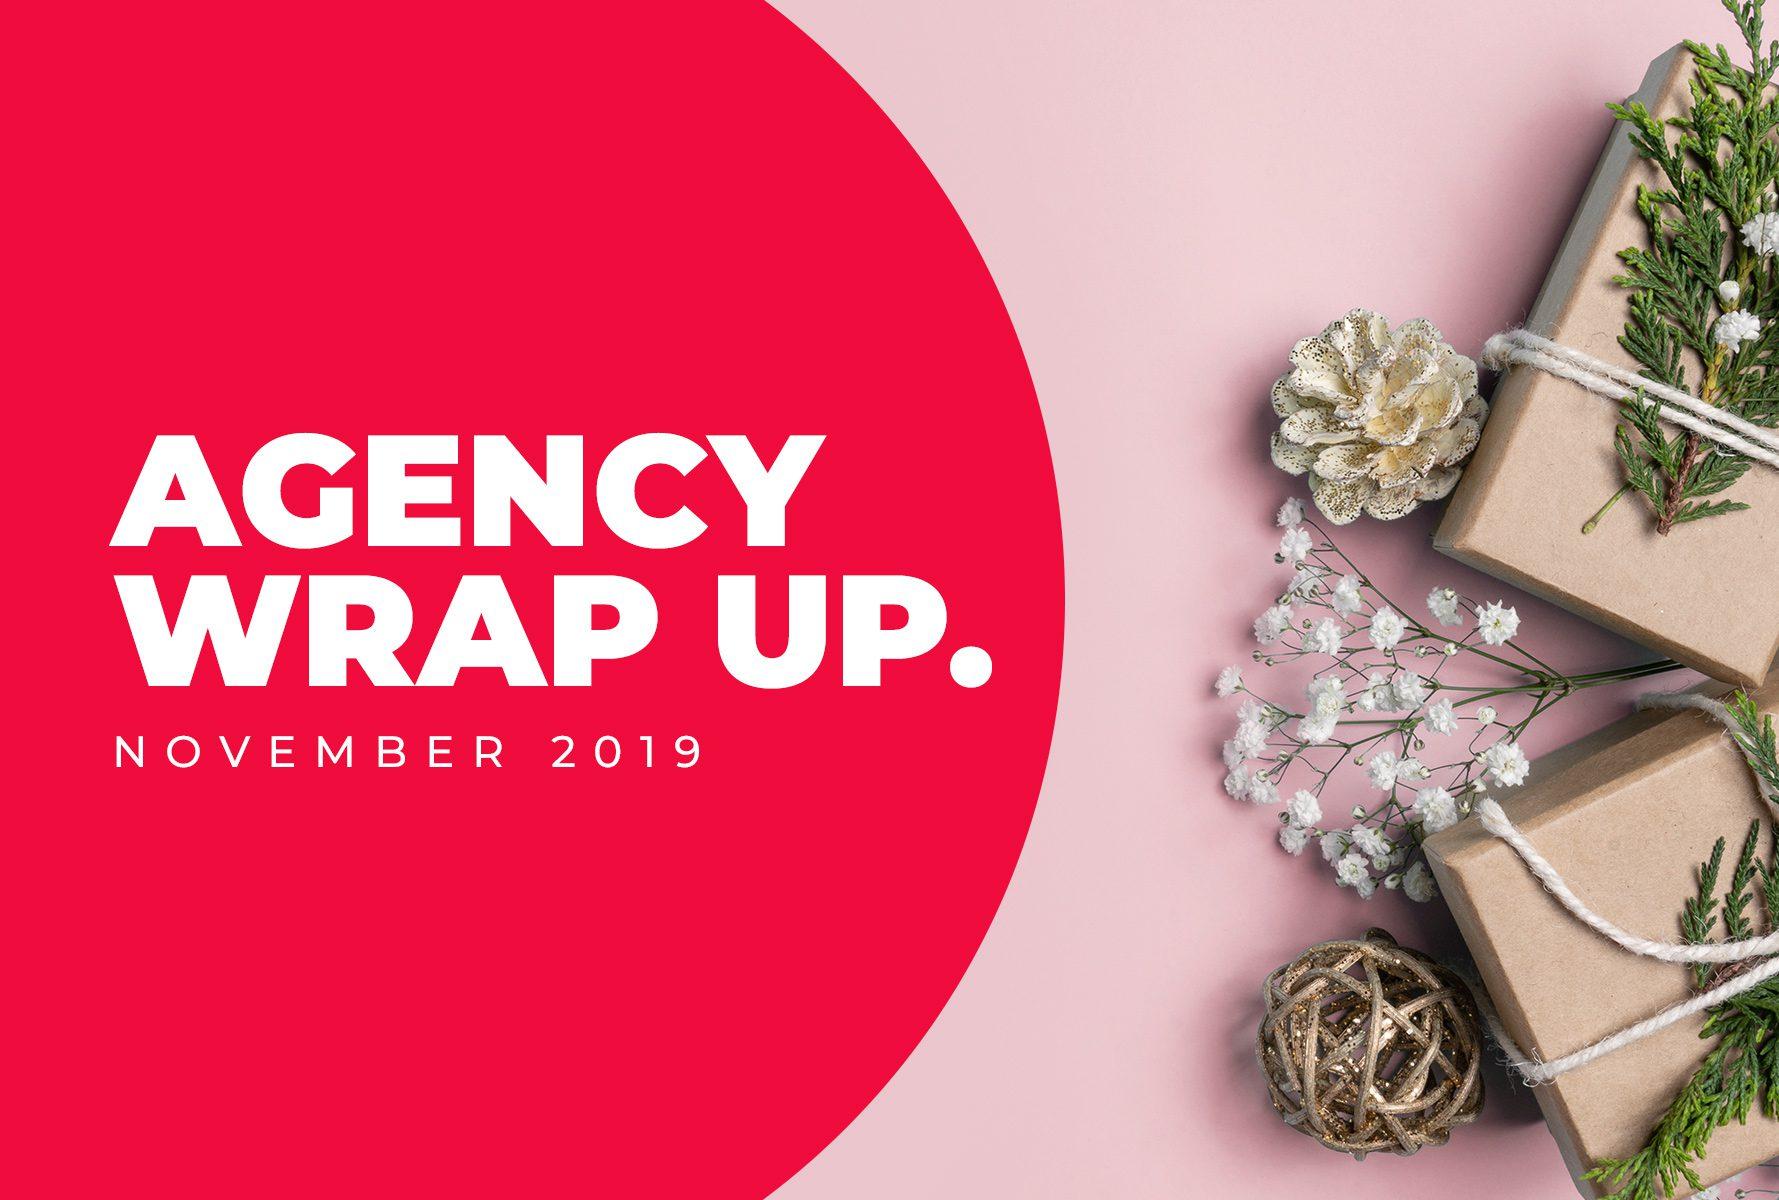 Agency Wrap Up – November 2019